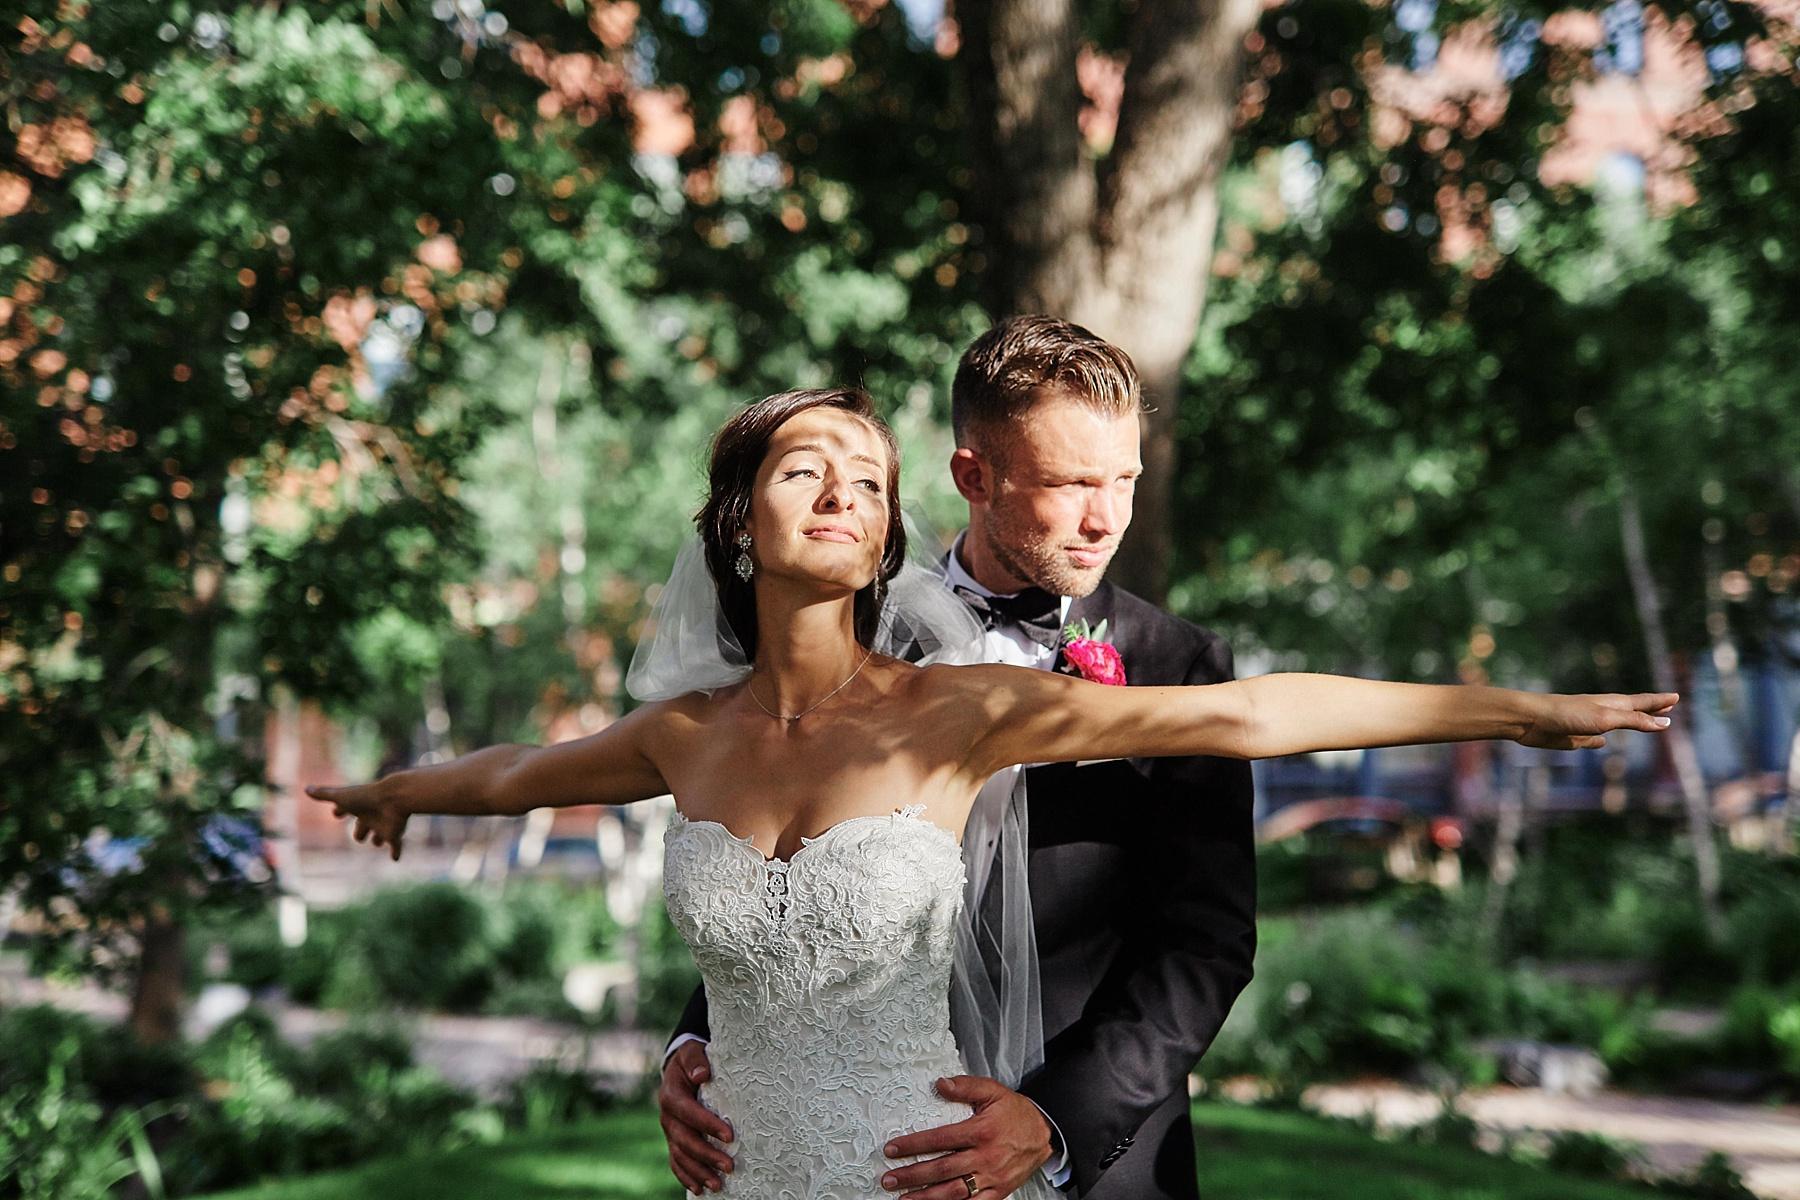 ABULAE-Wedding-Saint-paul-MN-Josh-Sofia-Wedding-Mears-Park_0801.jpg